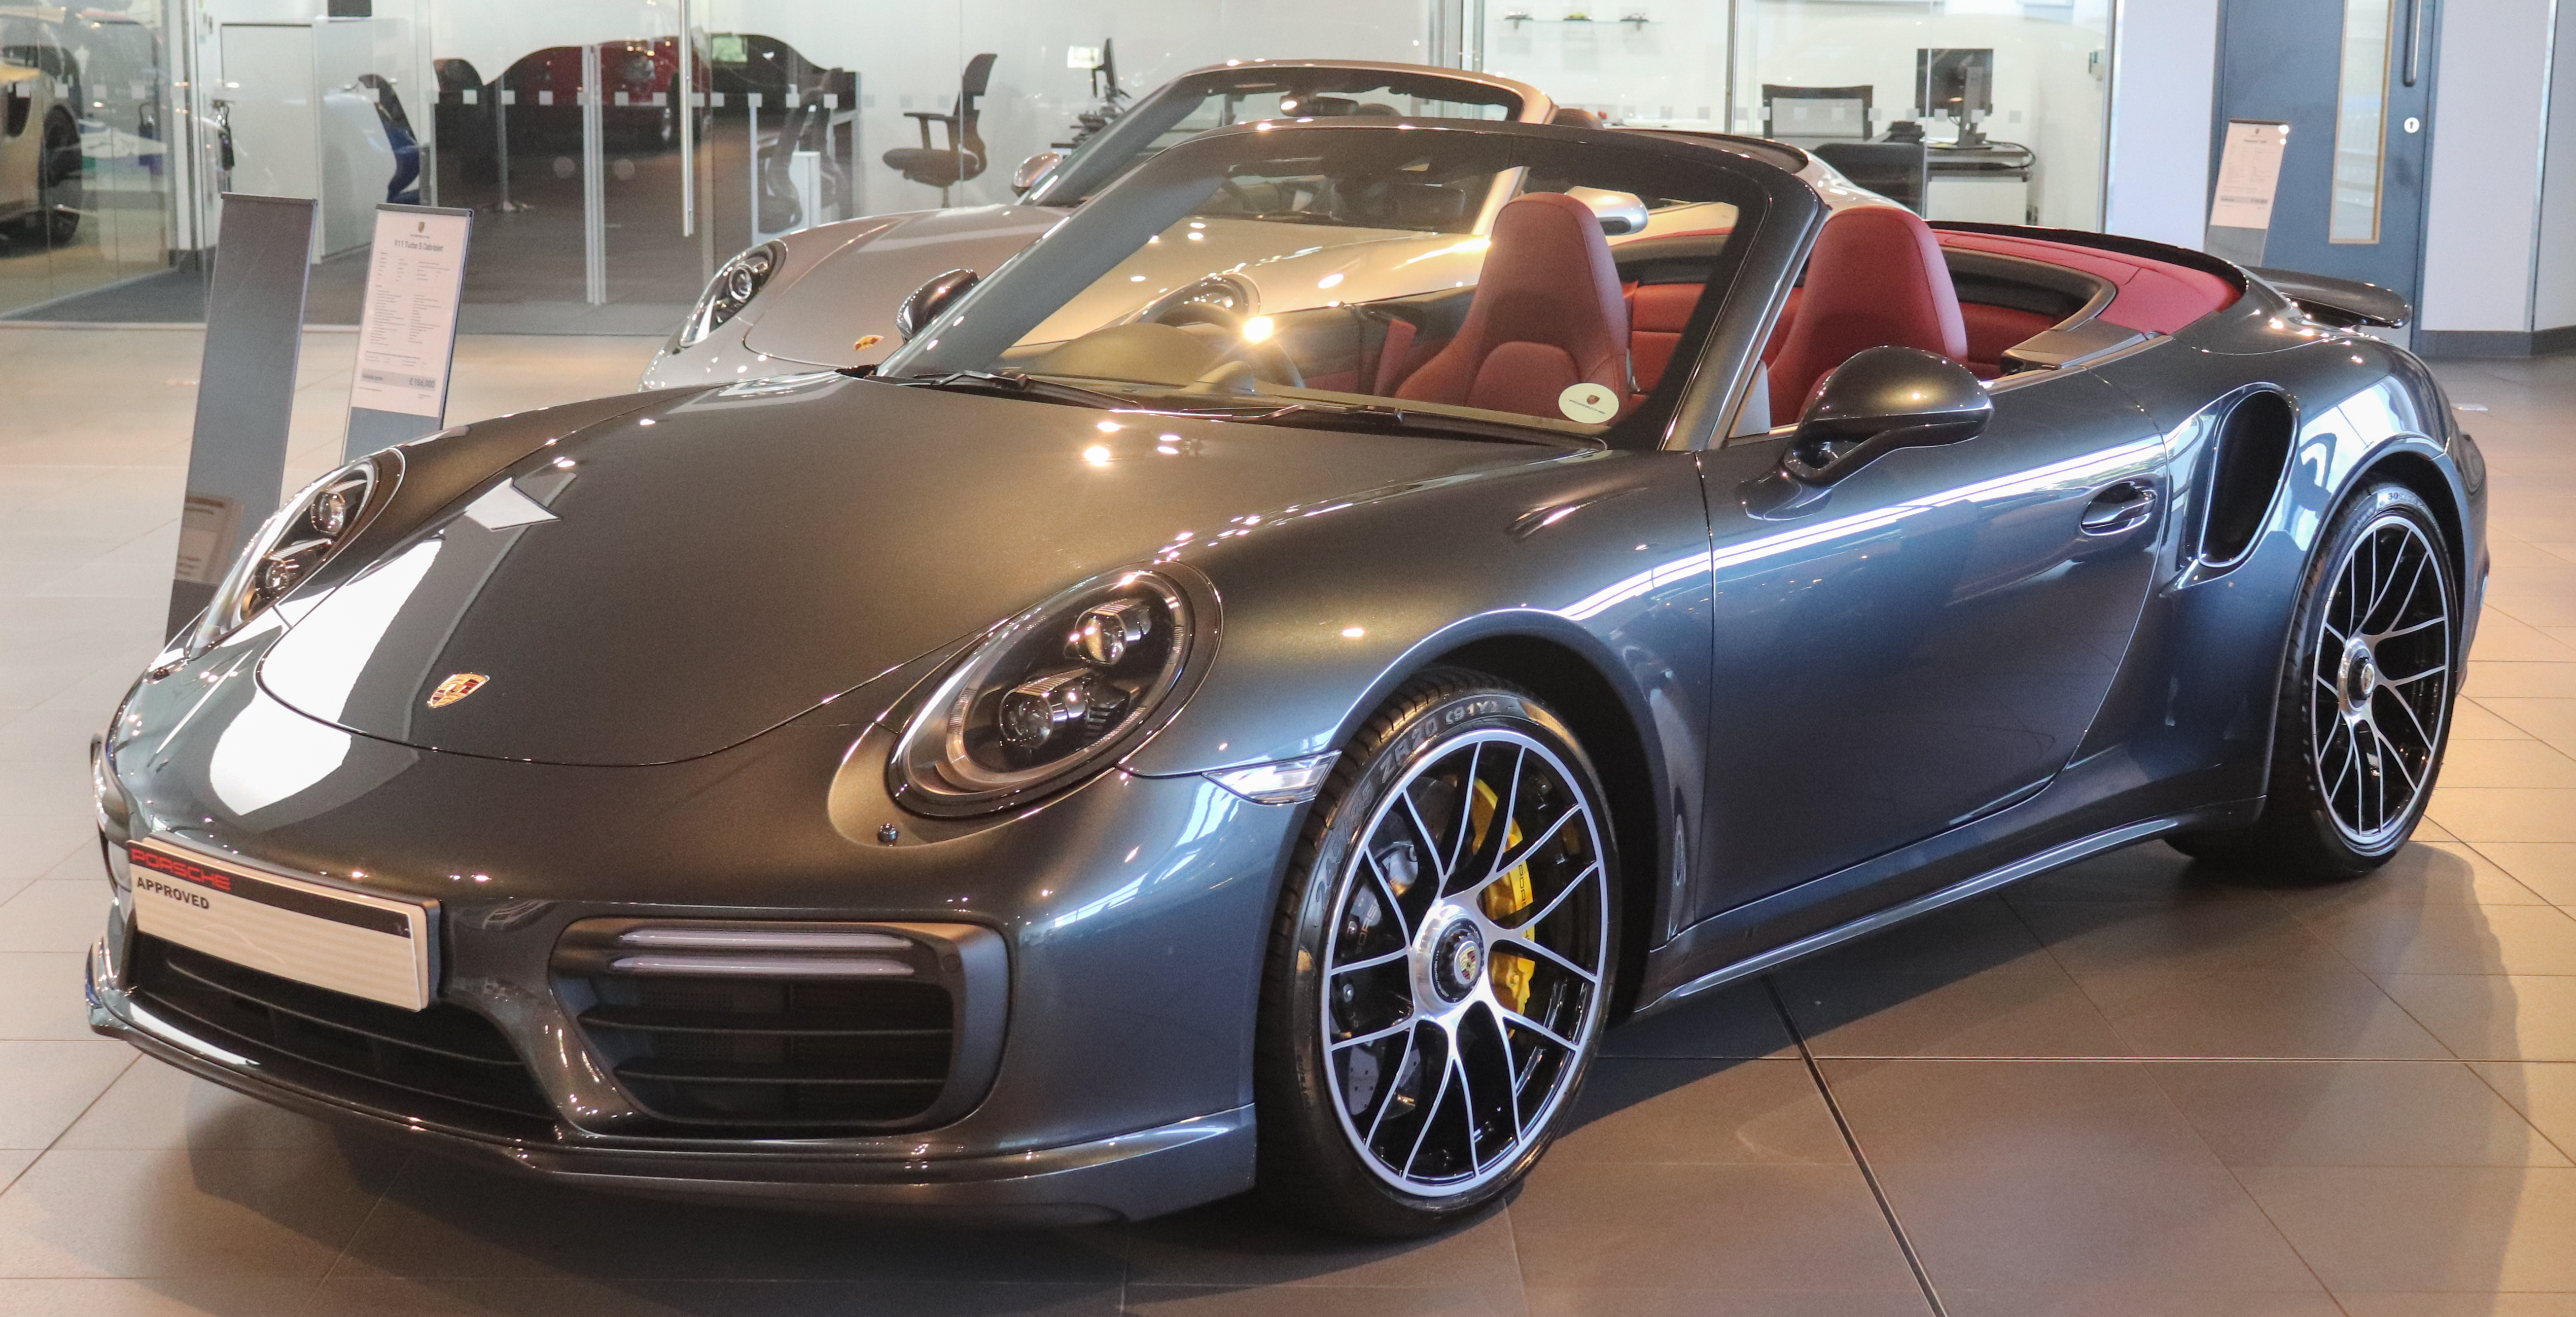 File 2017 Porsche 911 Turbo S Cabriolet 3 8 Jpg Wikimedia